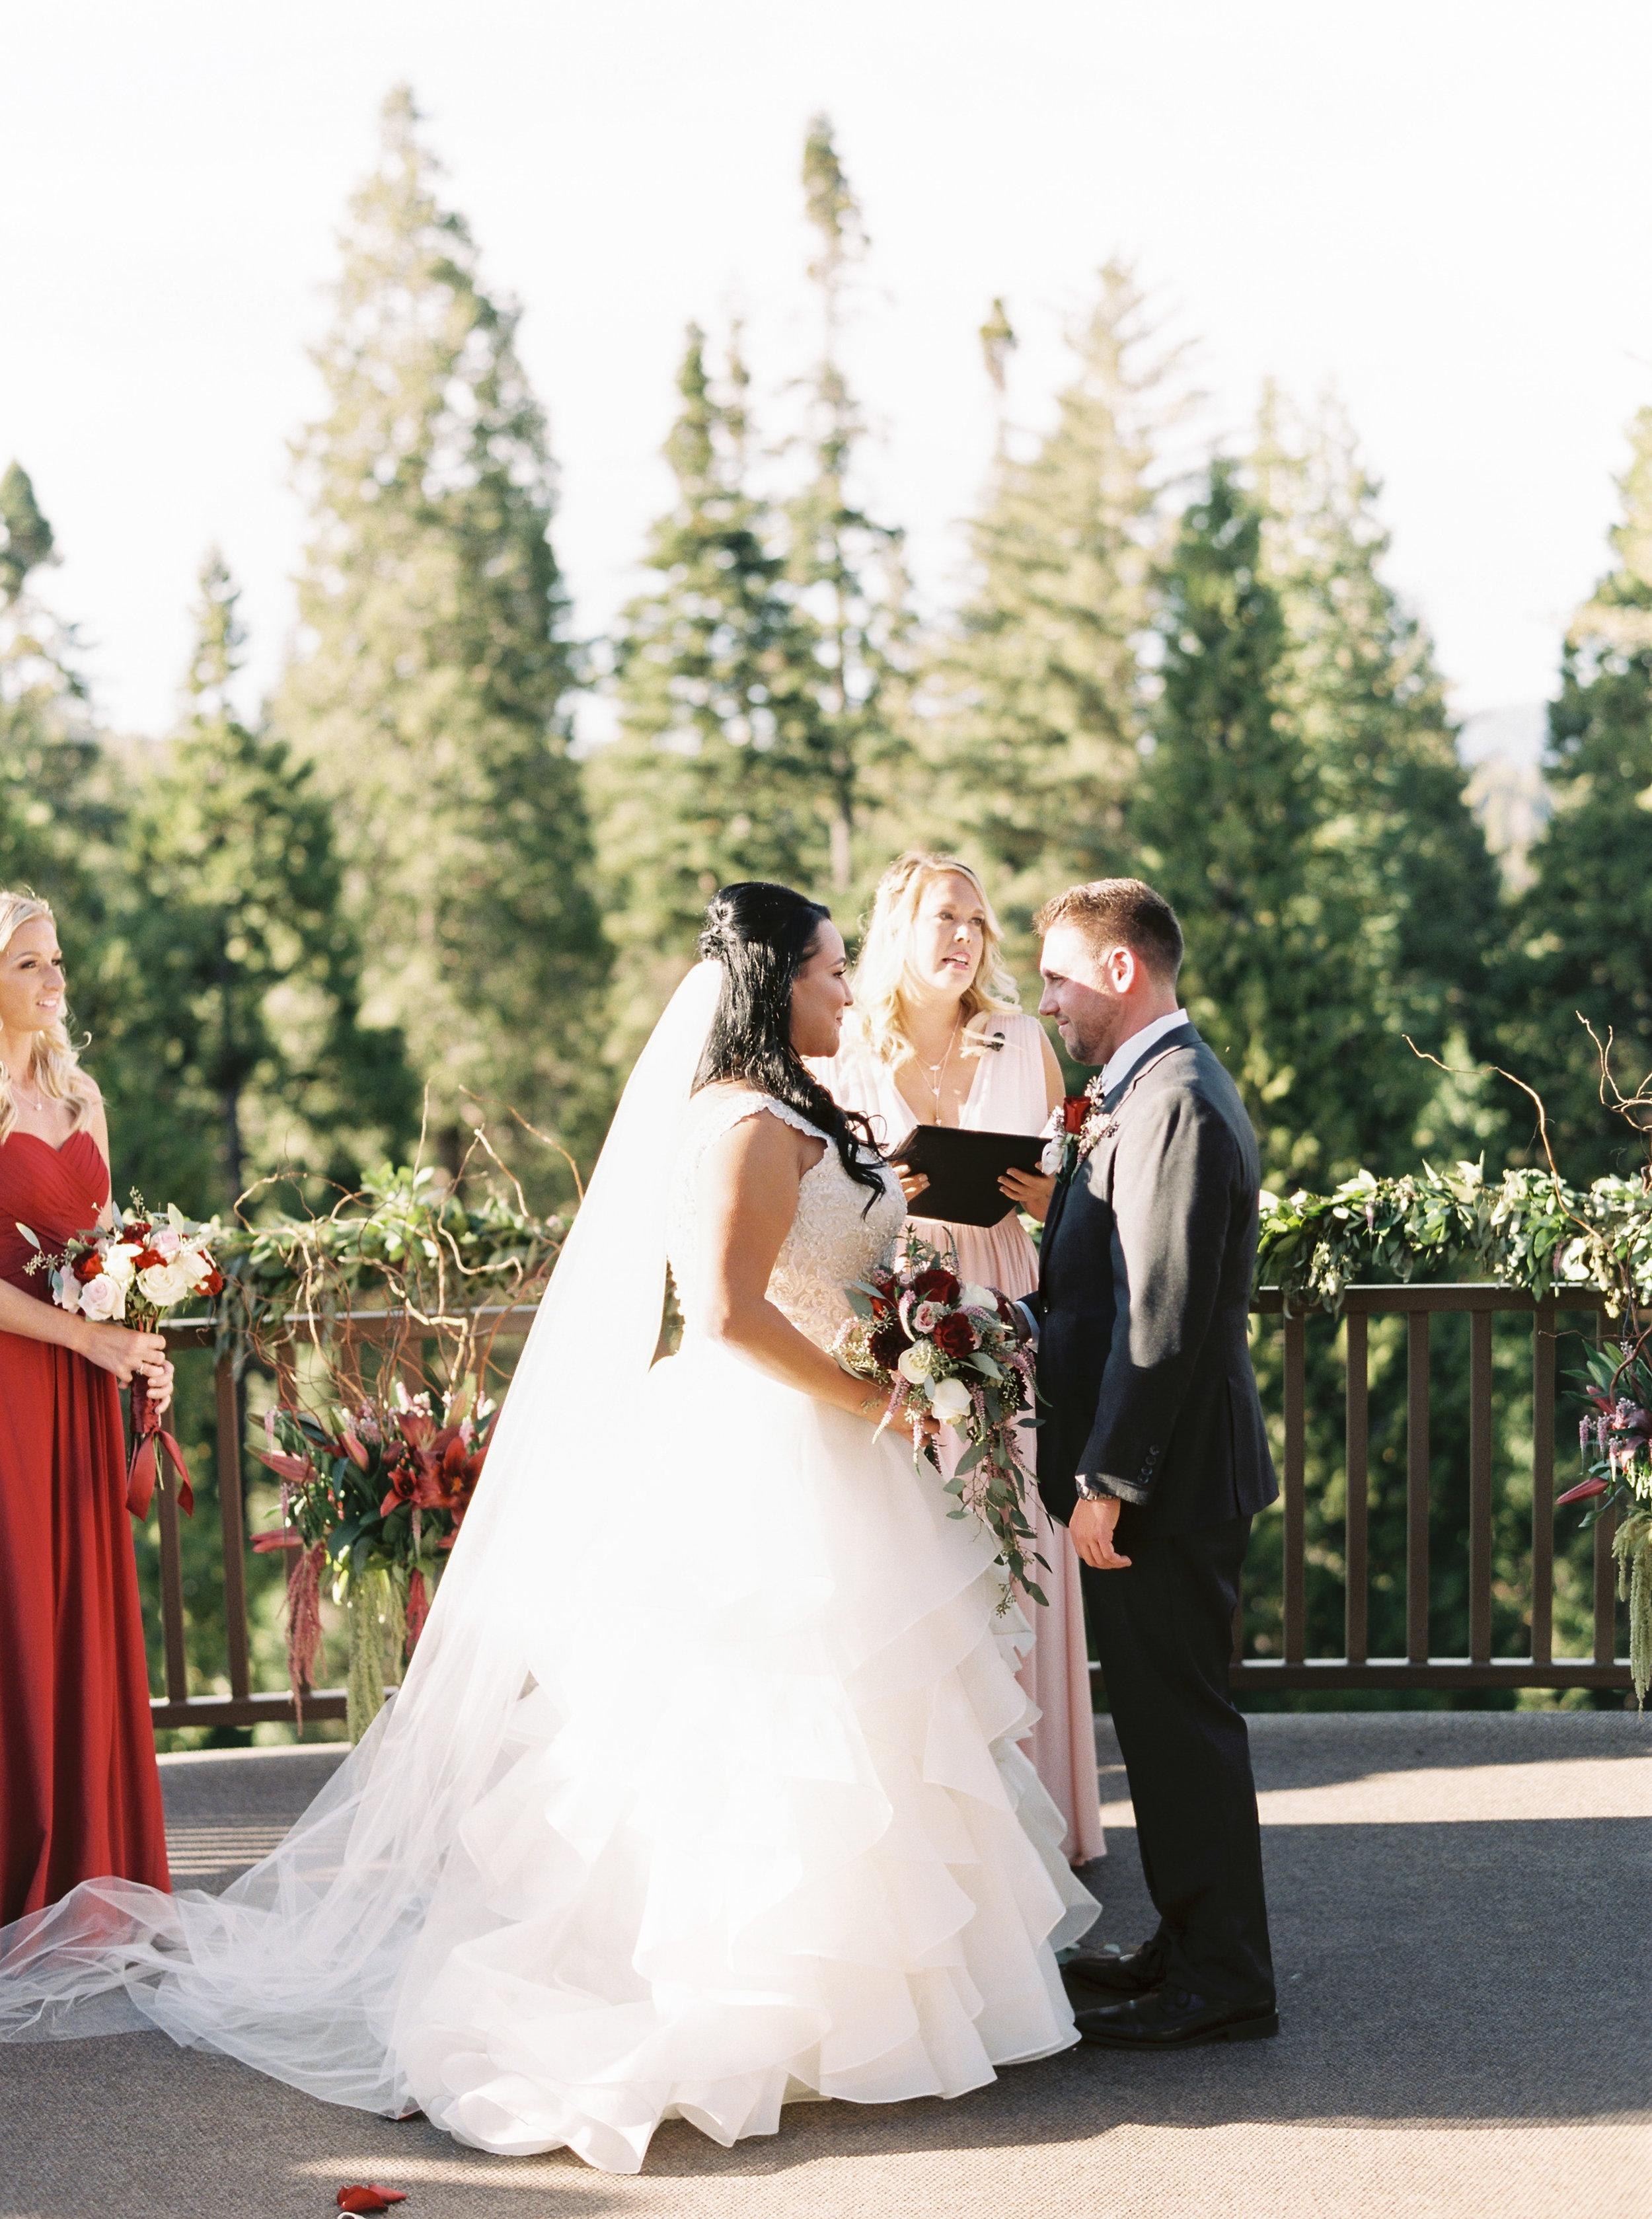 Tenaya-lodge-wedding-at-yosemite-national-park-california-75.jpg